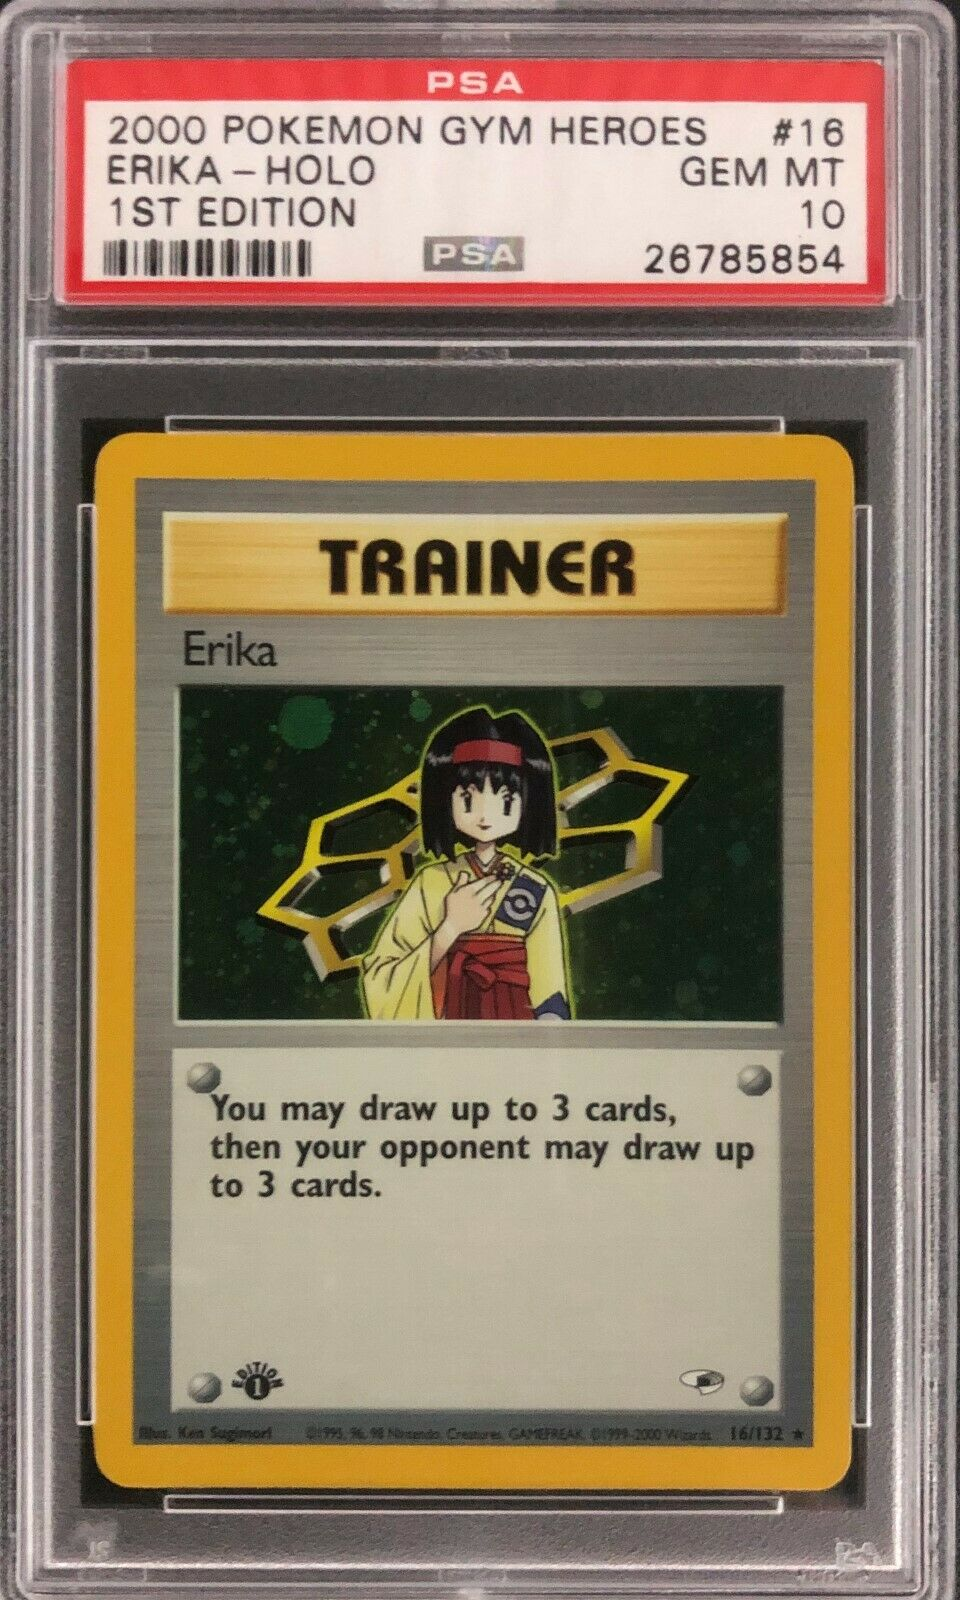 1st Edition Gym Heroes Erika Holo Pokemon Card Mint PSA 10